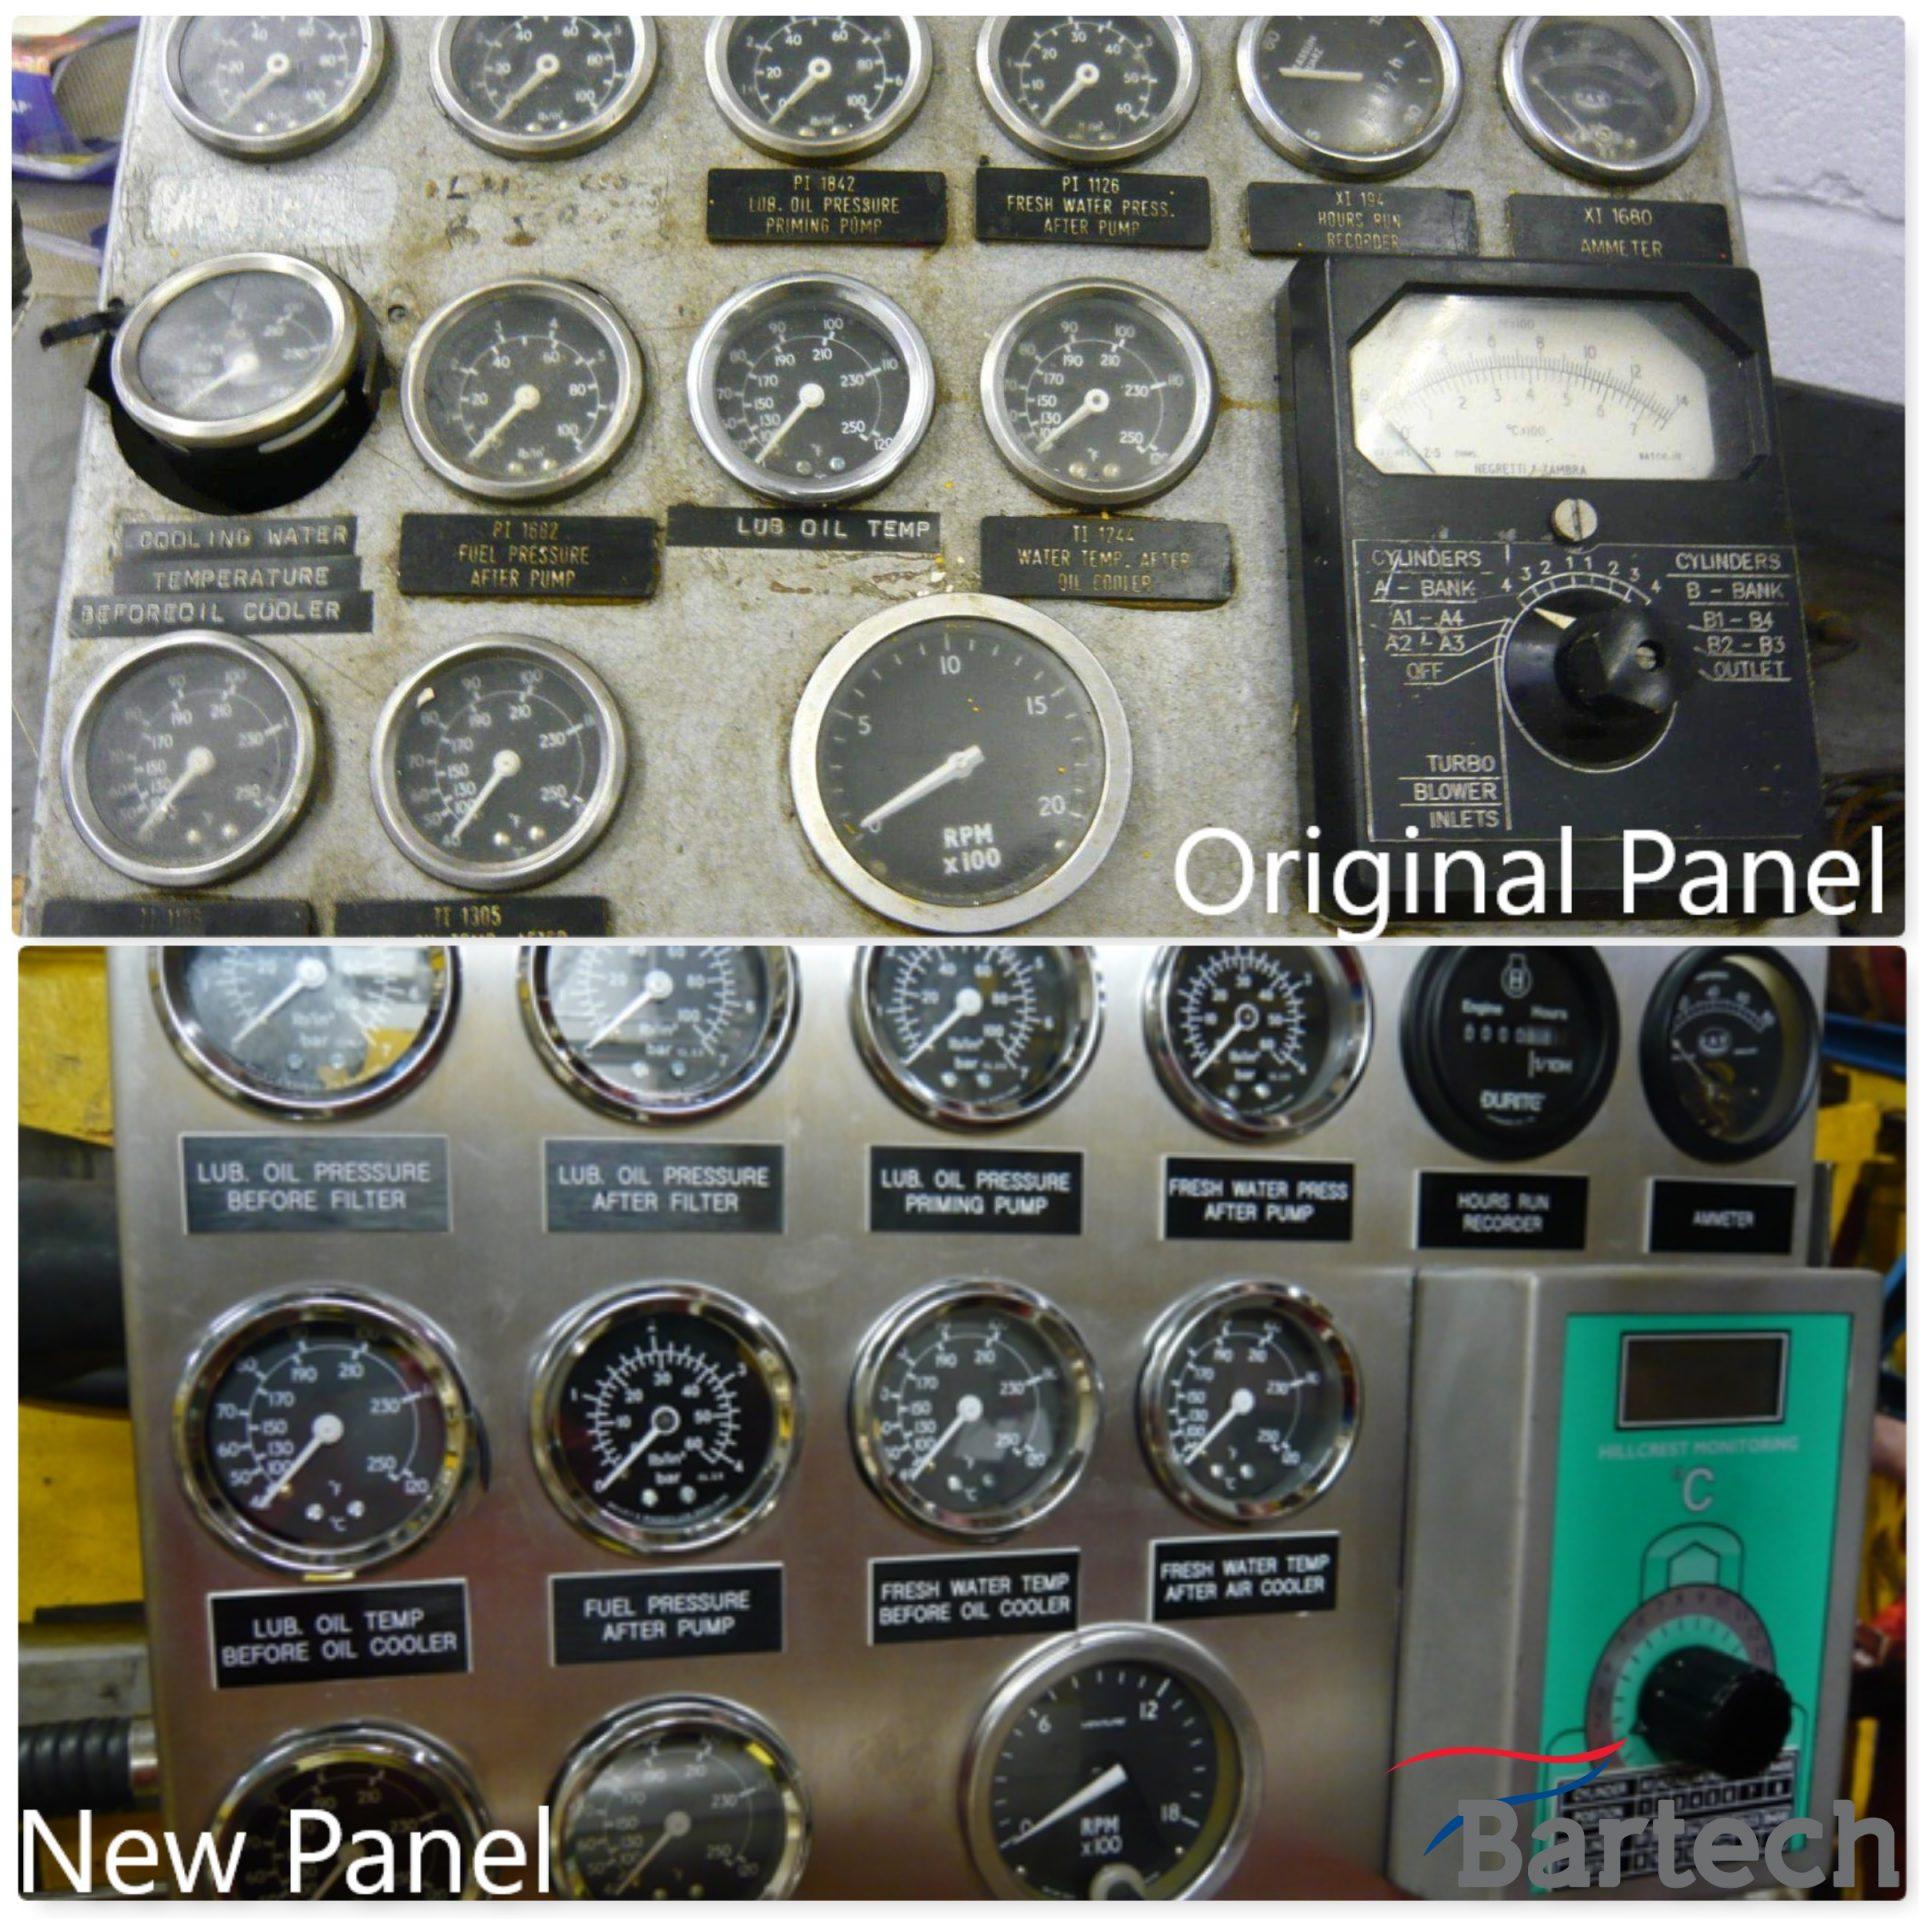 Original engine gauge panel and new Bartech made panel